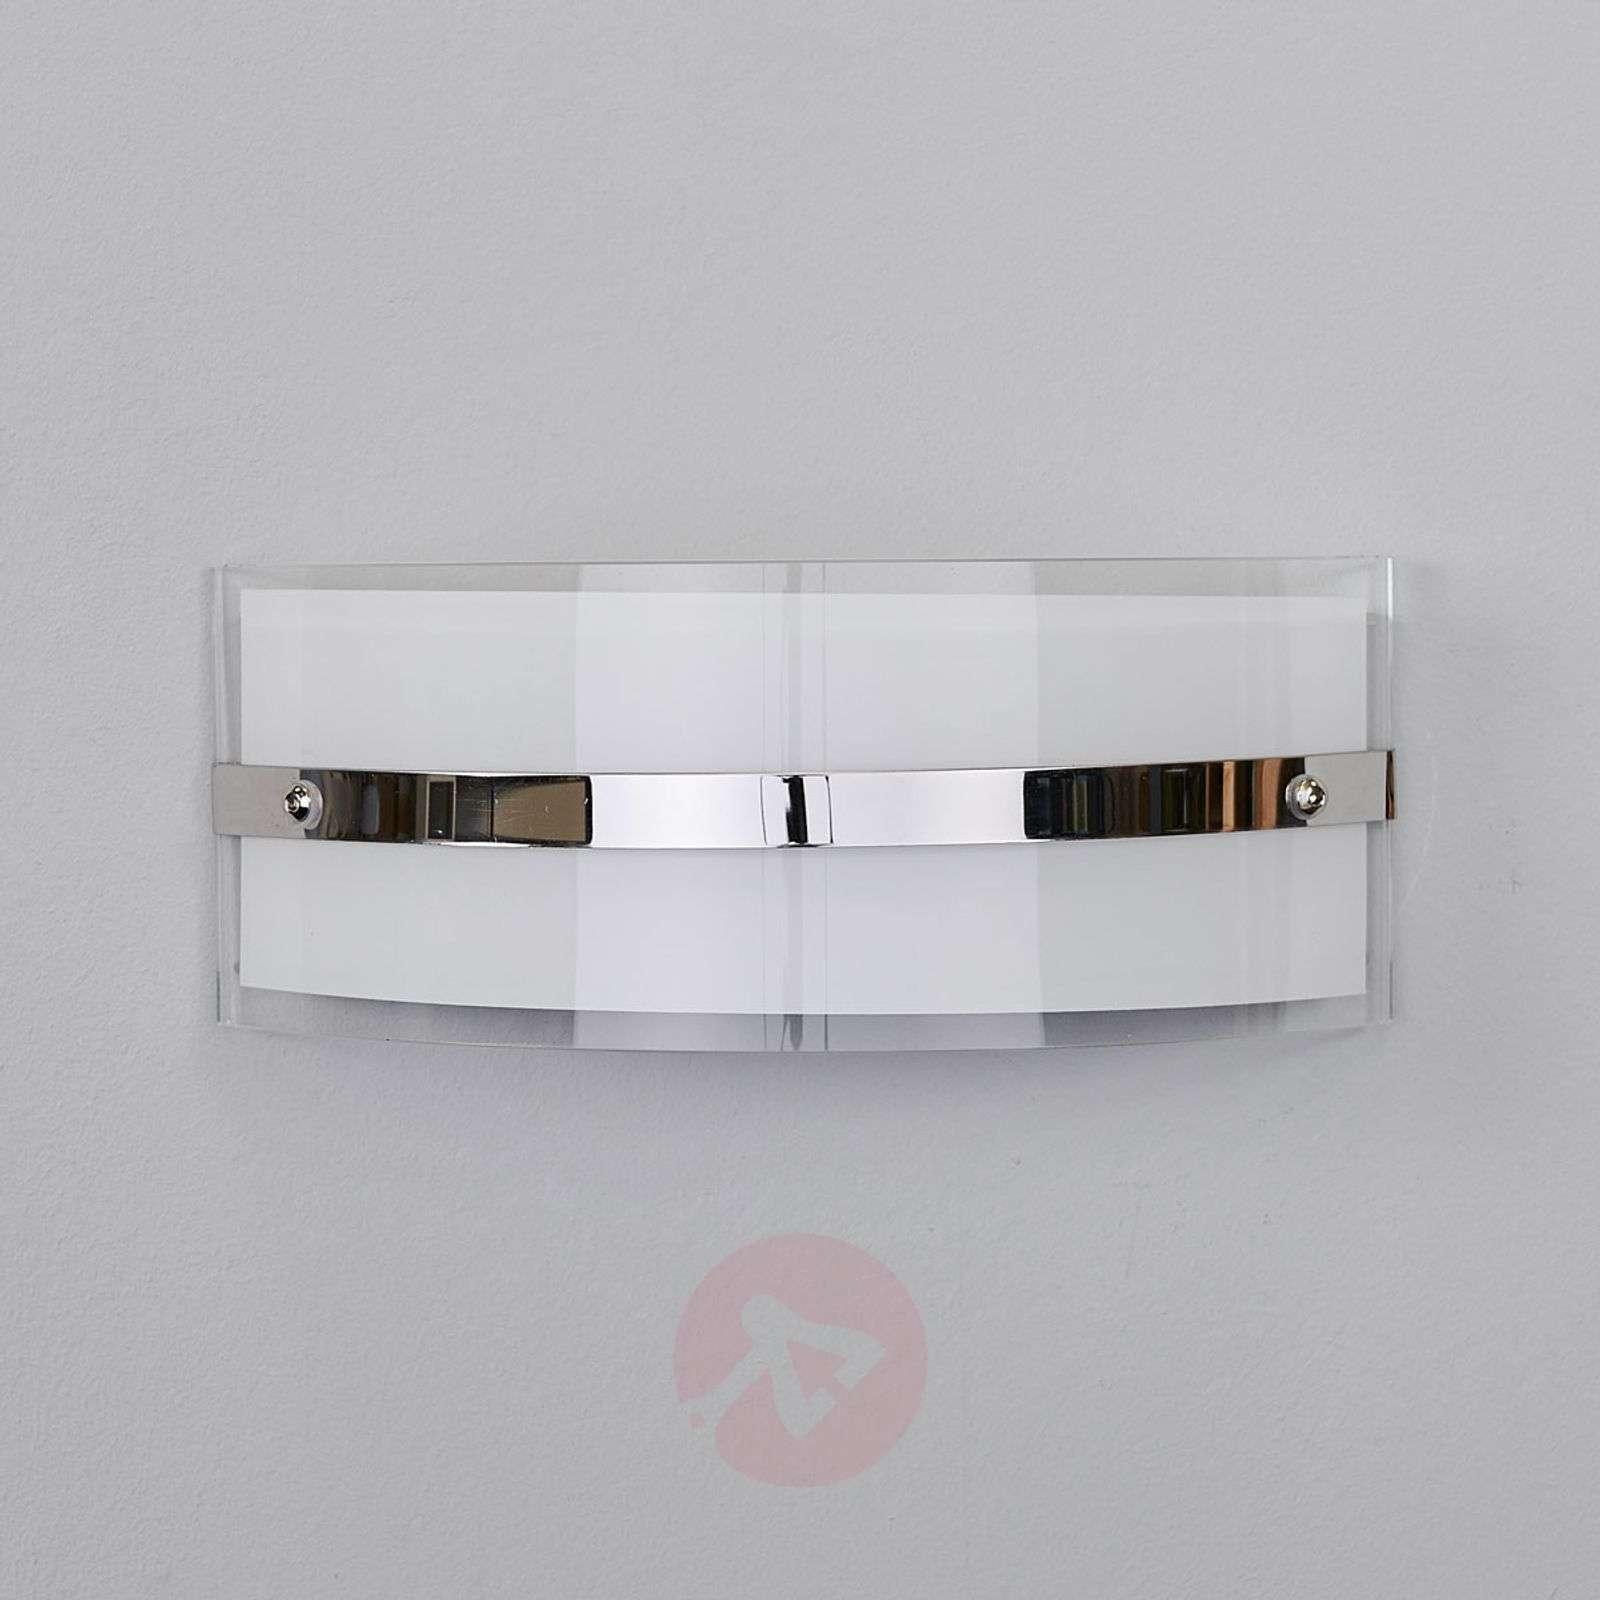 Glass wall lamp Lianda with LEDs, chrome-plated-9634065-01